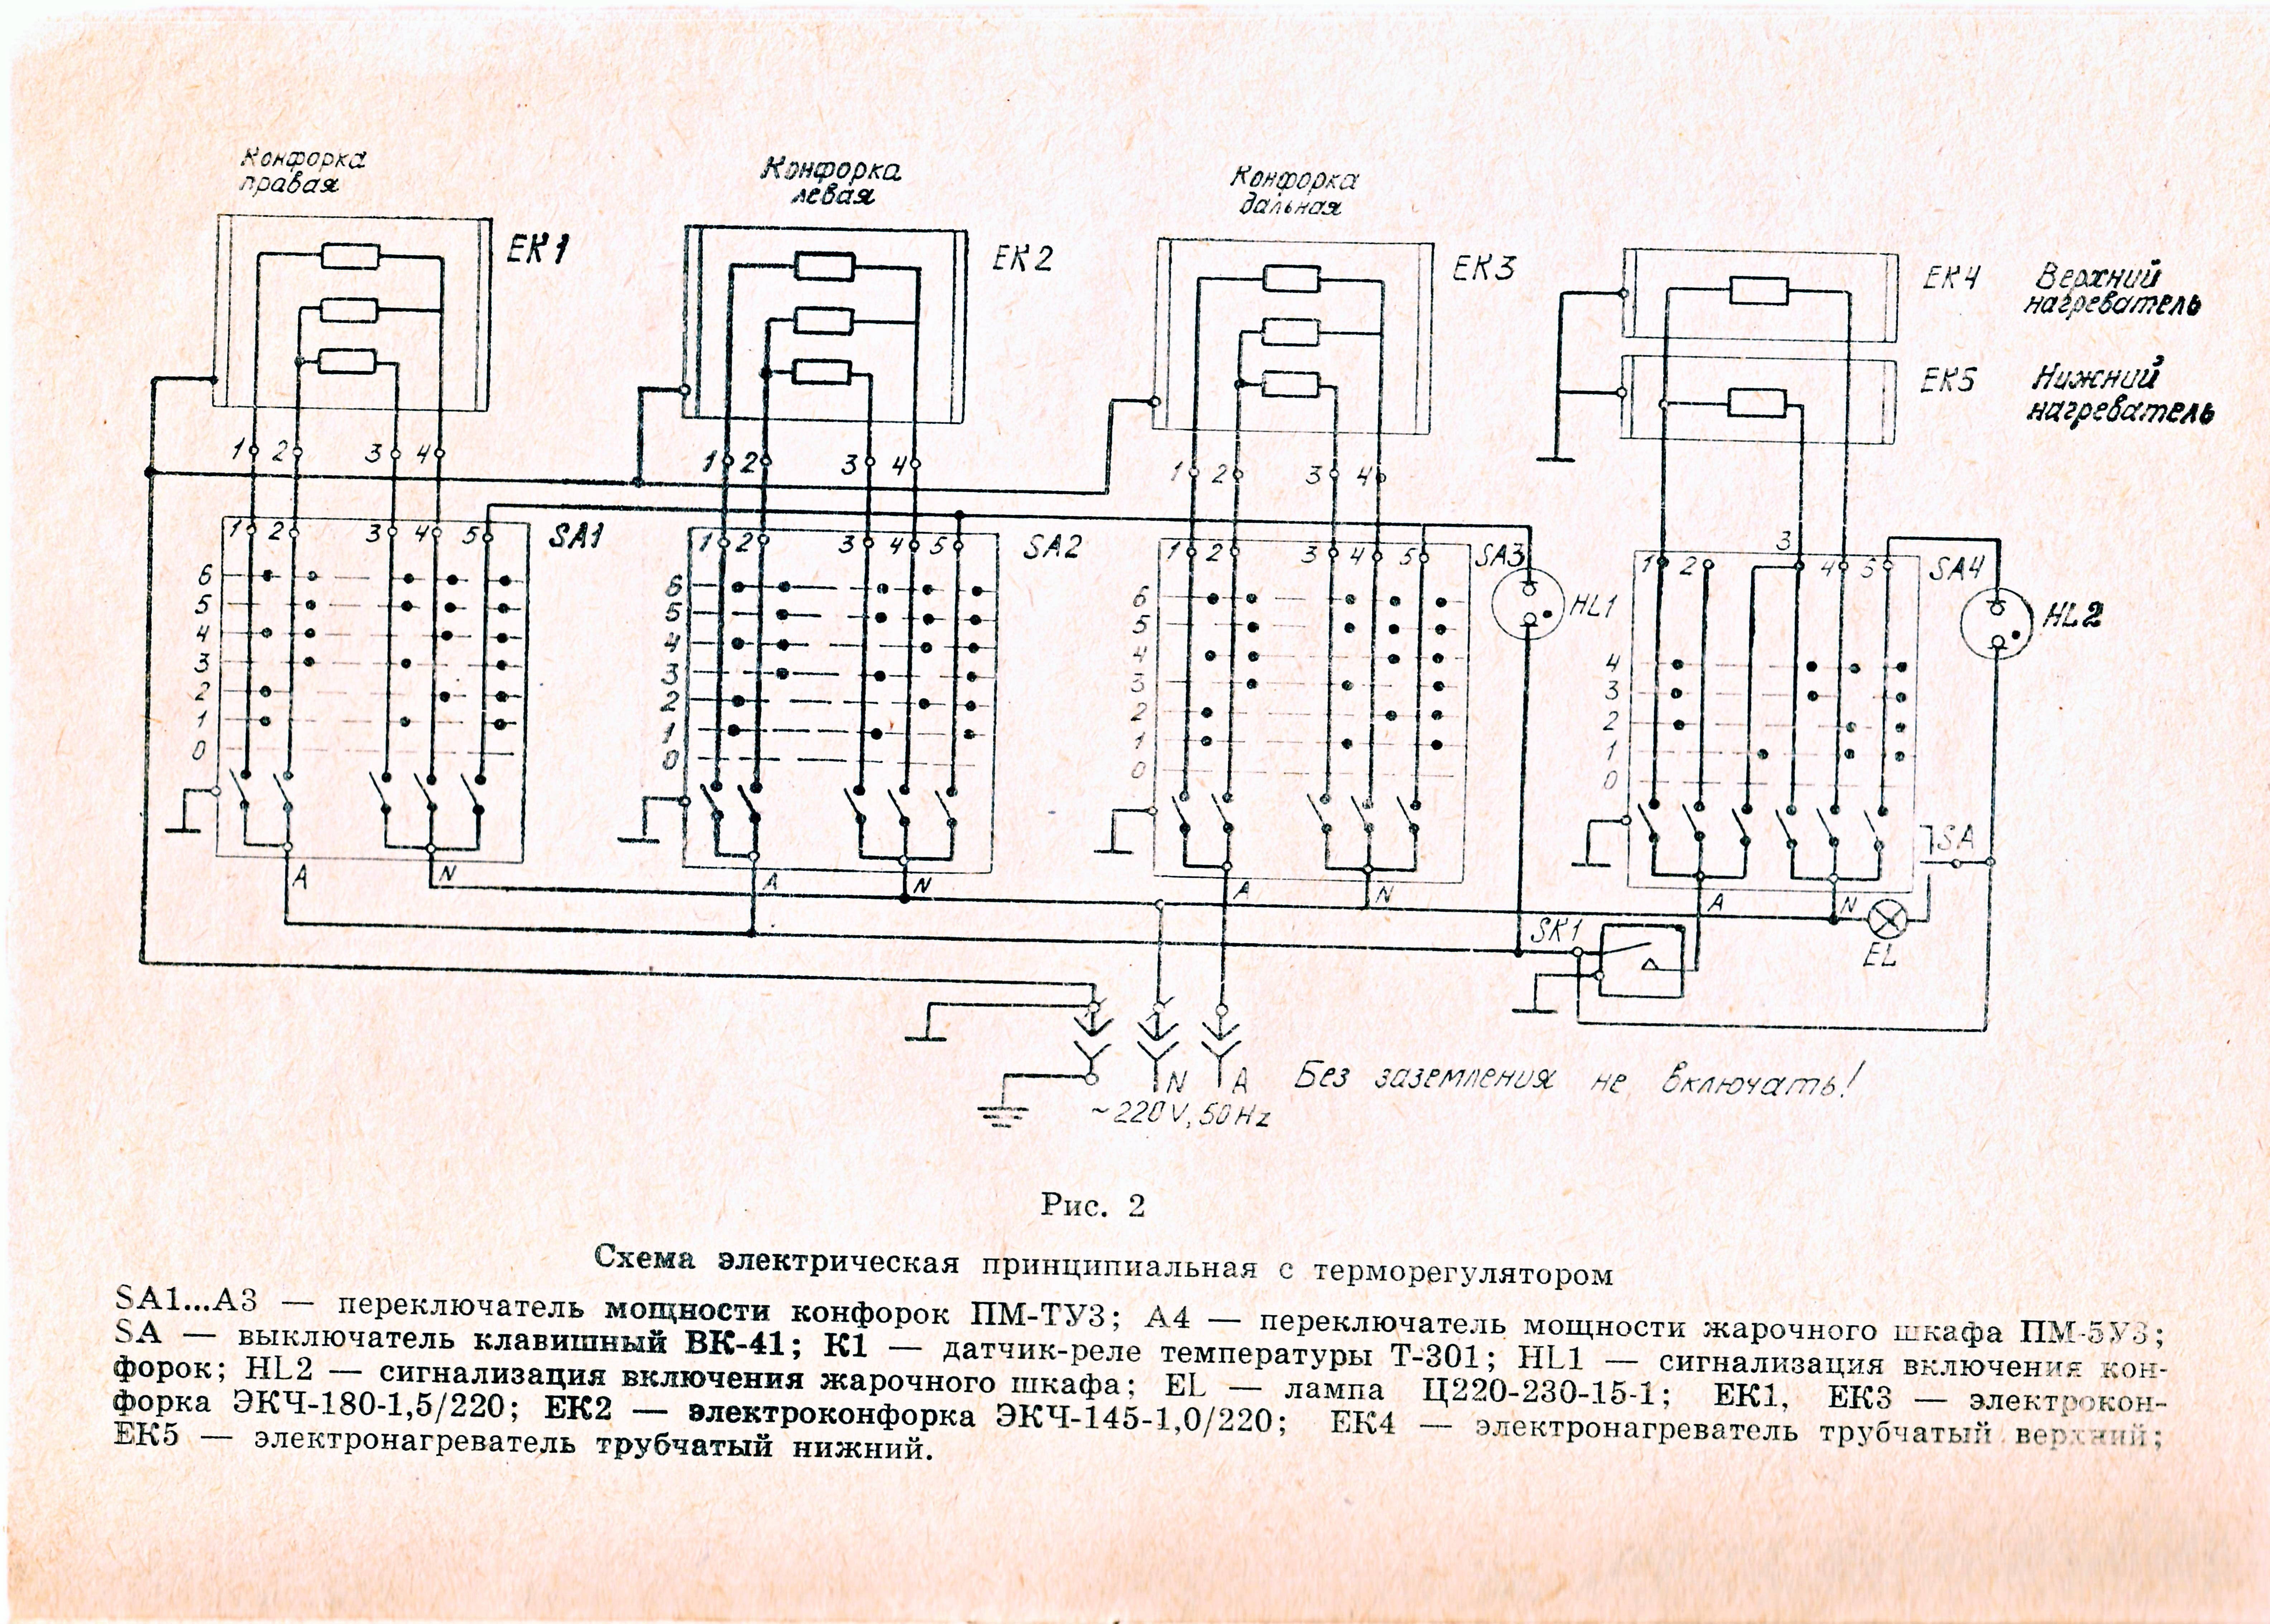 Unique Wiring Diagram For Electric Stove Outlet  Diagram  Diagramsample  Diagramtemplate